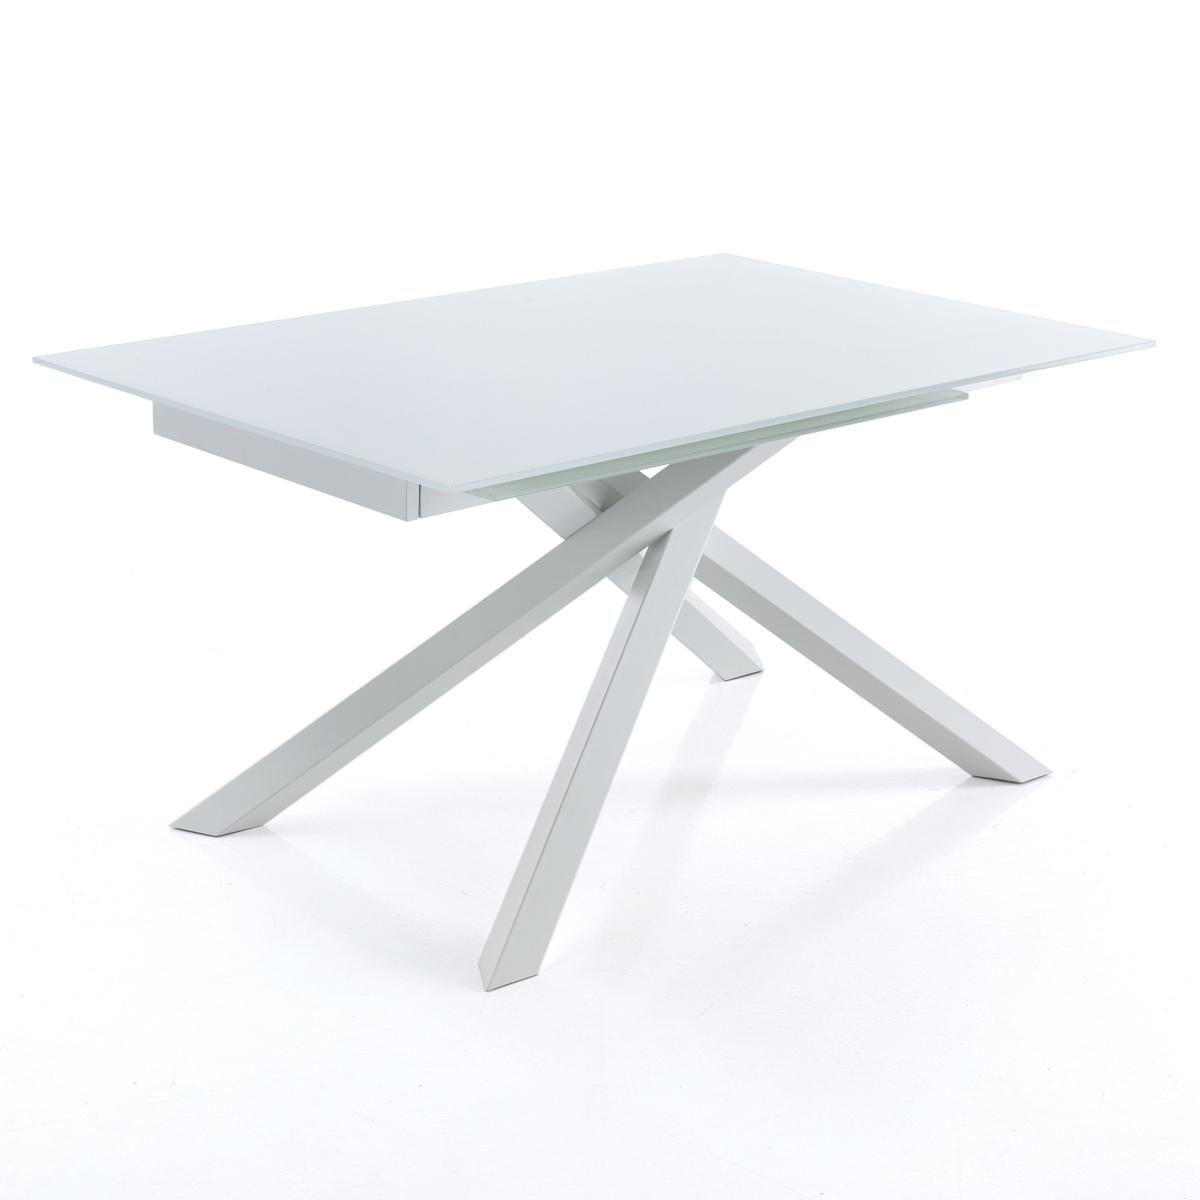 Meccanismo Per Tavoli Allungabili.Tavoli Fissi E Allungabili Tavolo Allungabile Shanghai White